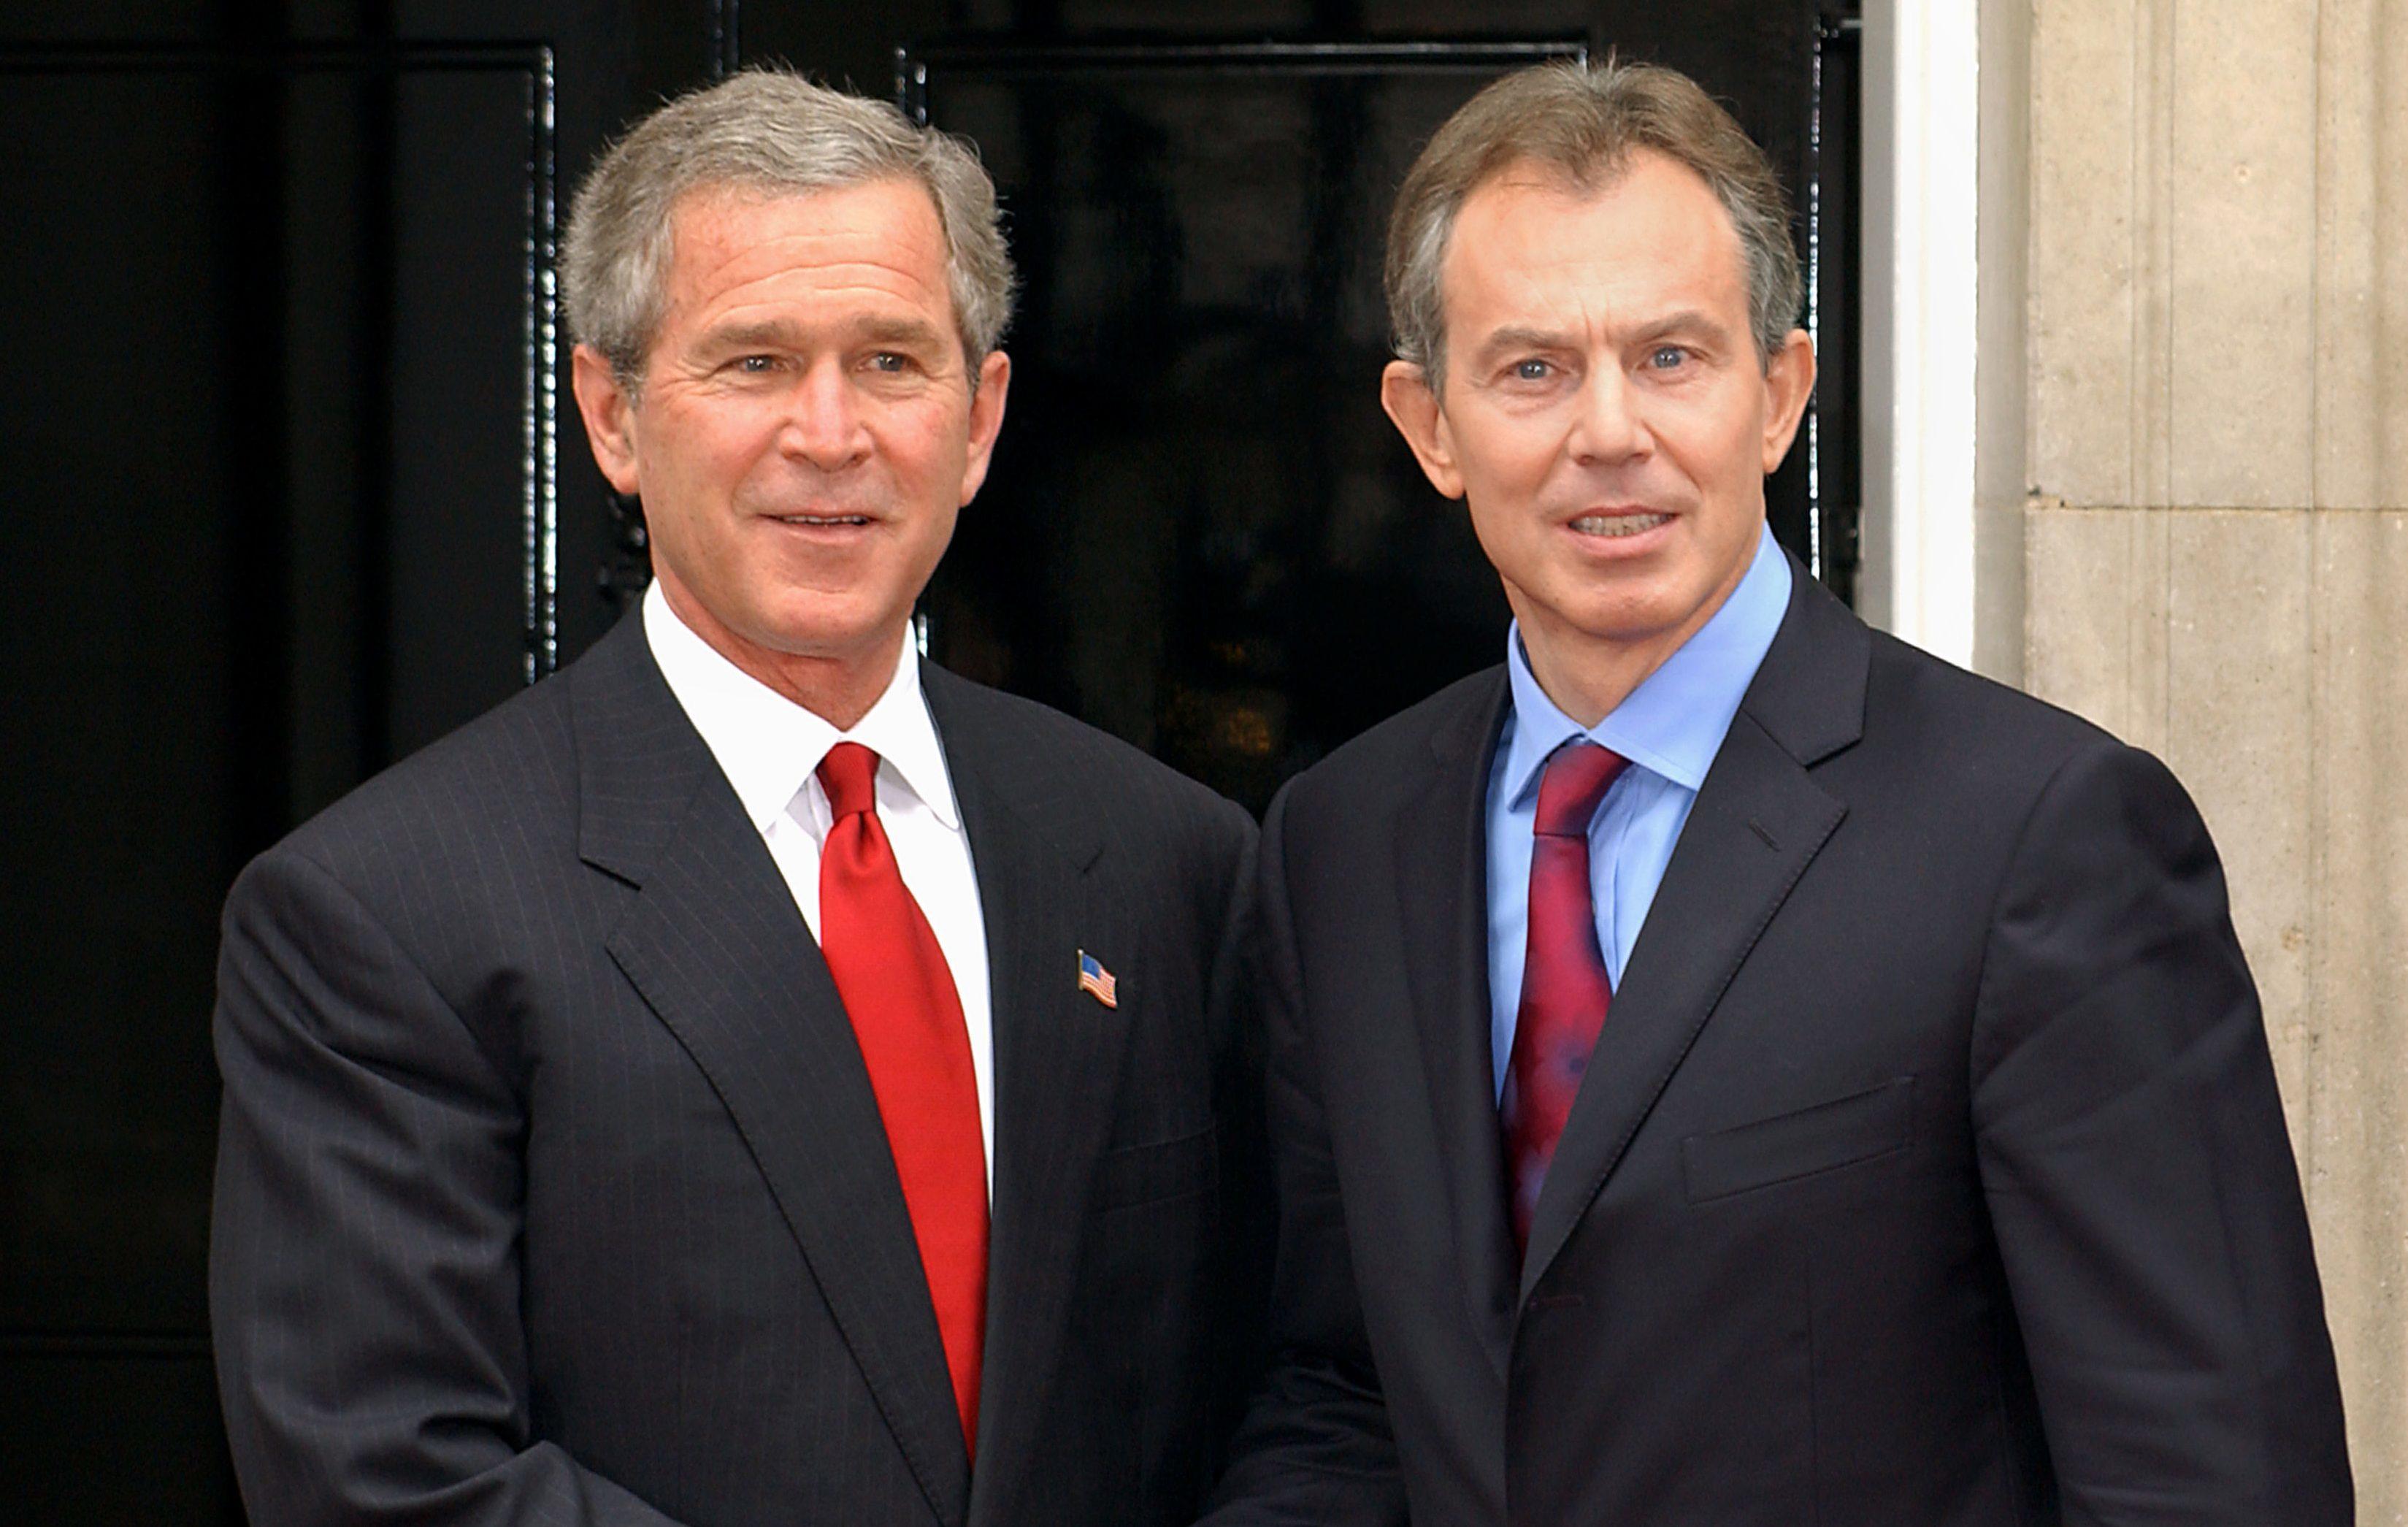 Tony Blair (right) alongside former US President George Bush (Fiona Hanson/PA)